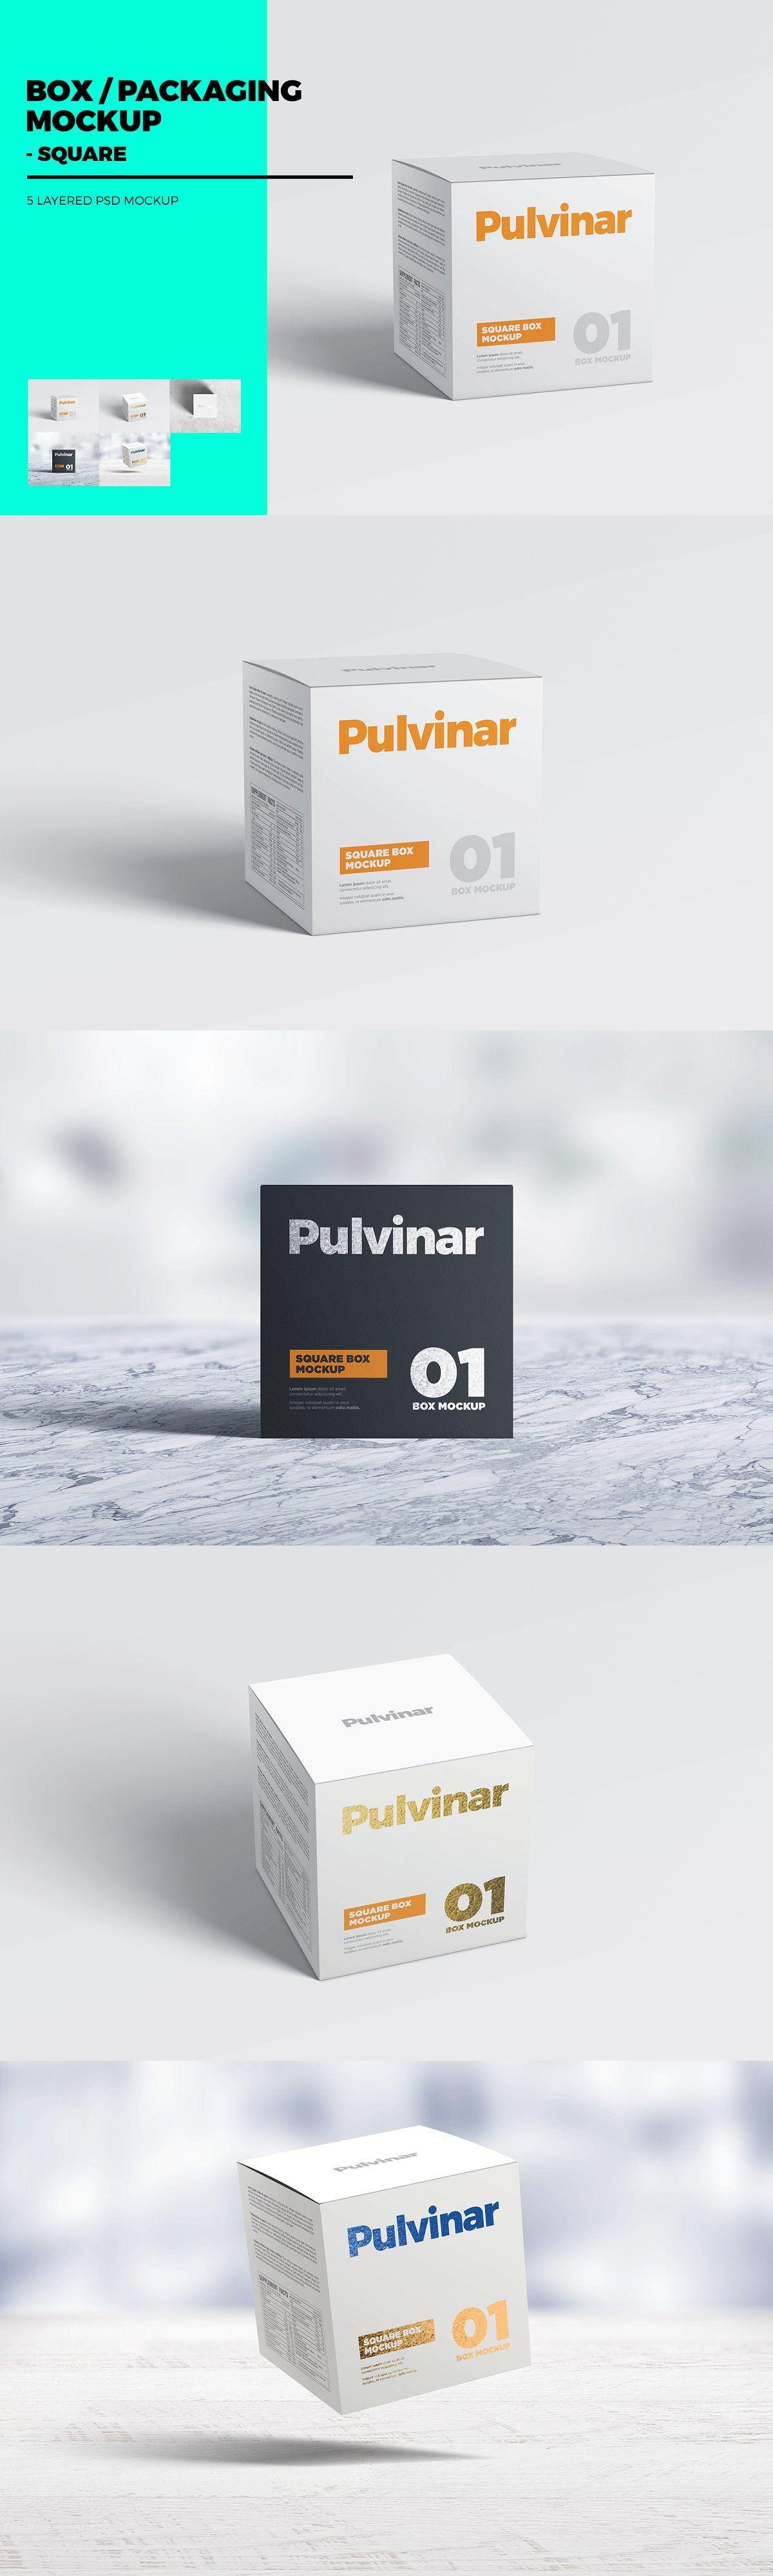 Download Box Packaging Mockup Square Packaging Mockup Box Packaging Container Design